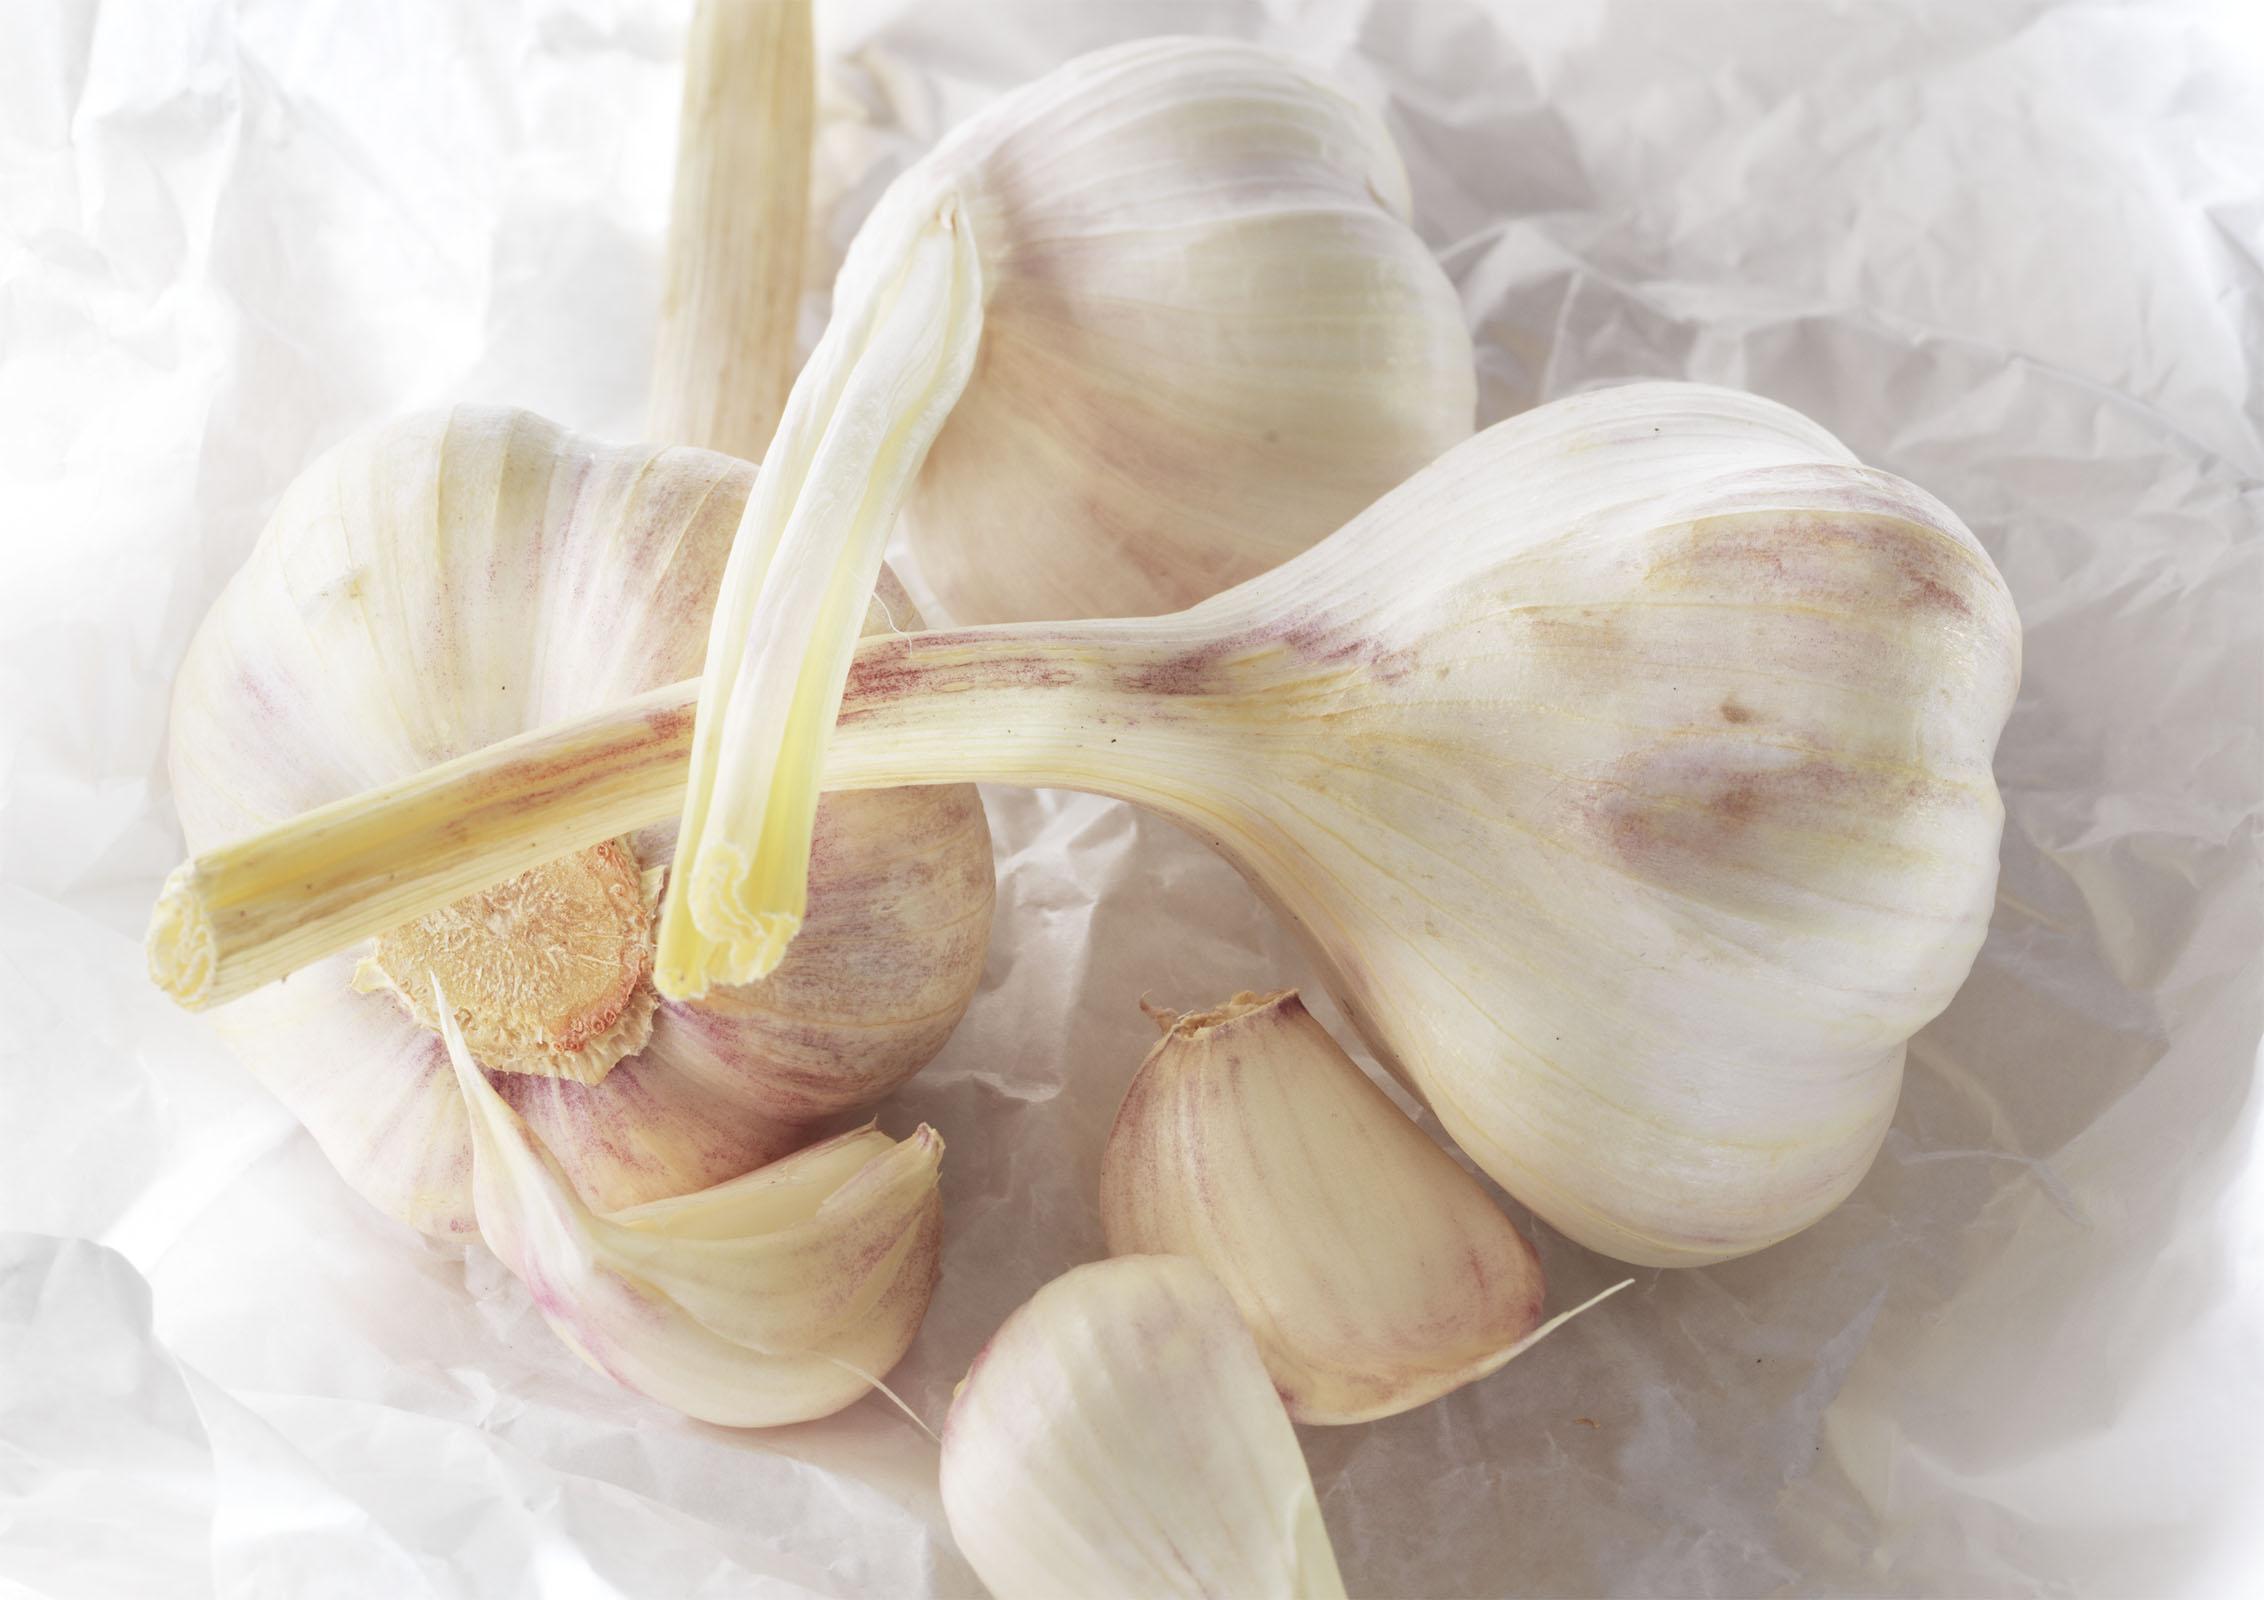 https://crisp.cc/wp-content/uploads/2019/09/Garlic-Gathering.jpg